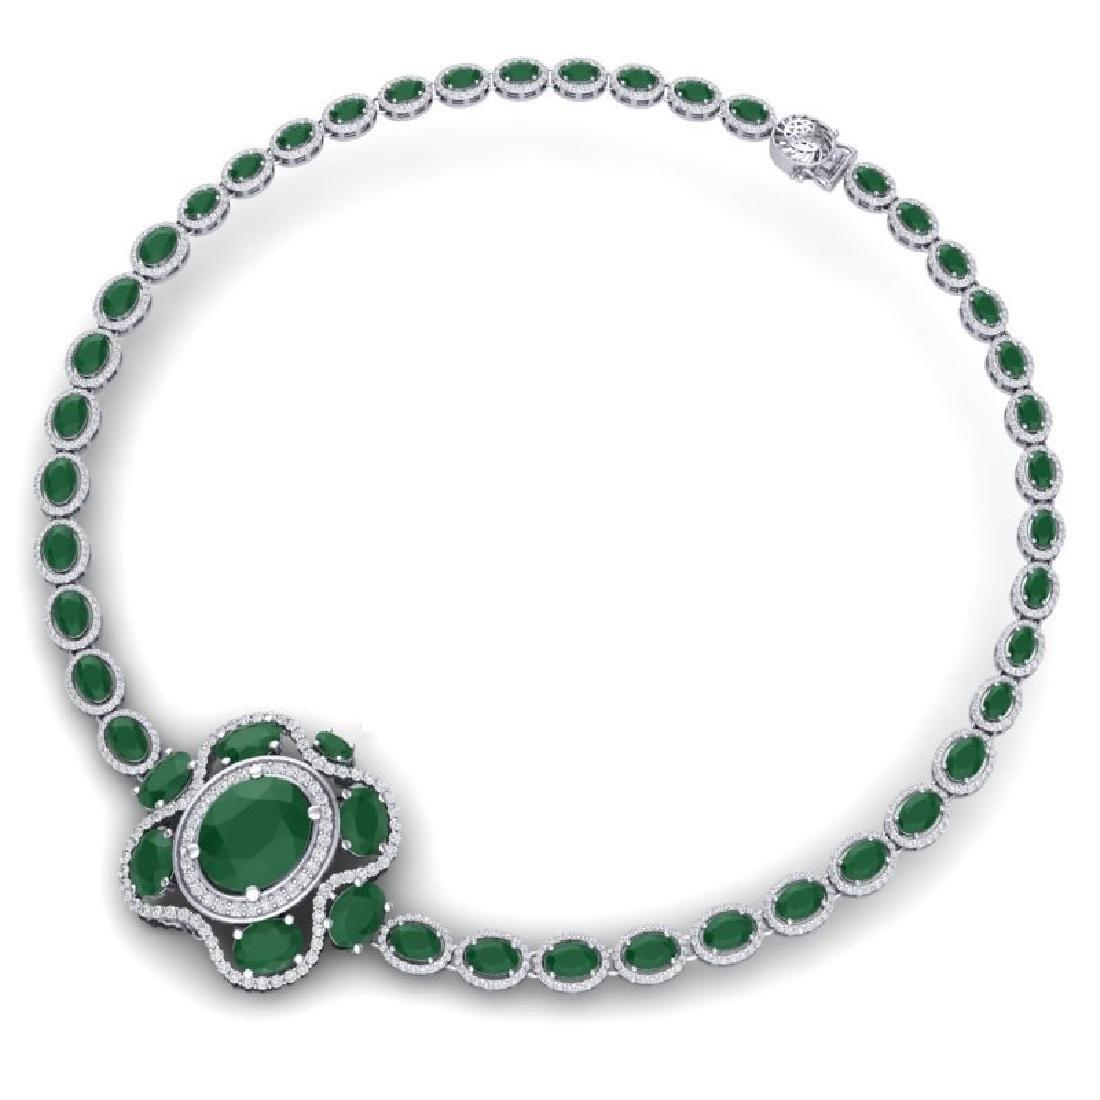 47.43 CTW Royalty Ruby & VS Diamond Necklace 18K White - 2